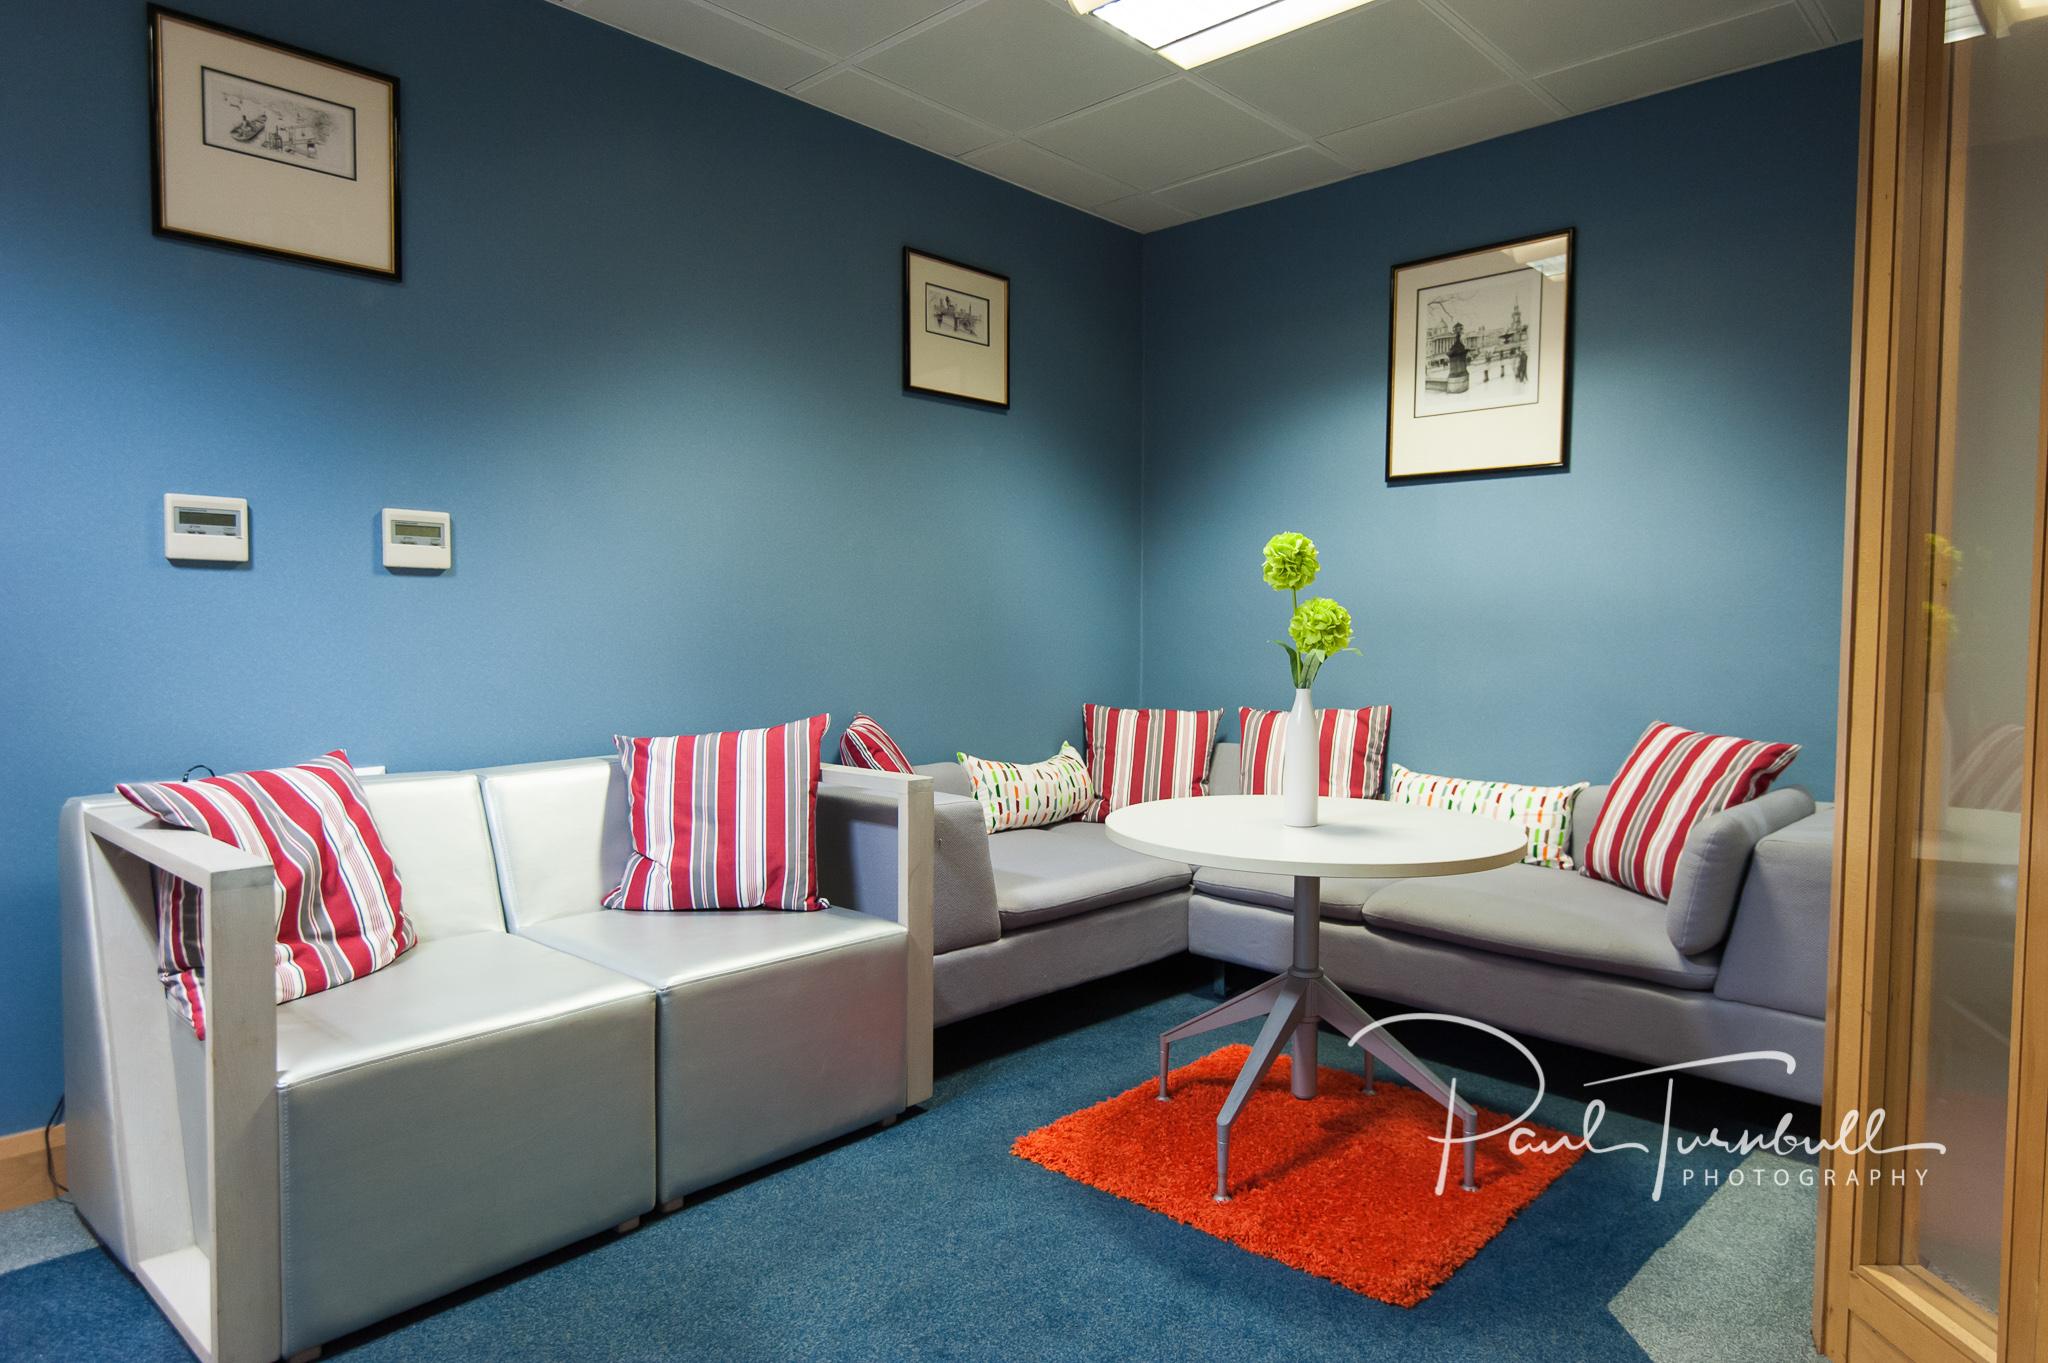 commercial-property-photographer-leeds-yorkshire-rs-hostels-007.jpg